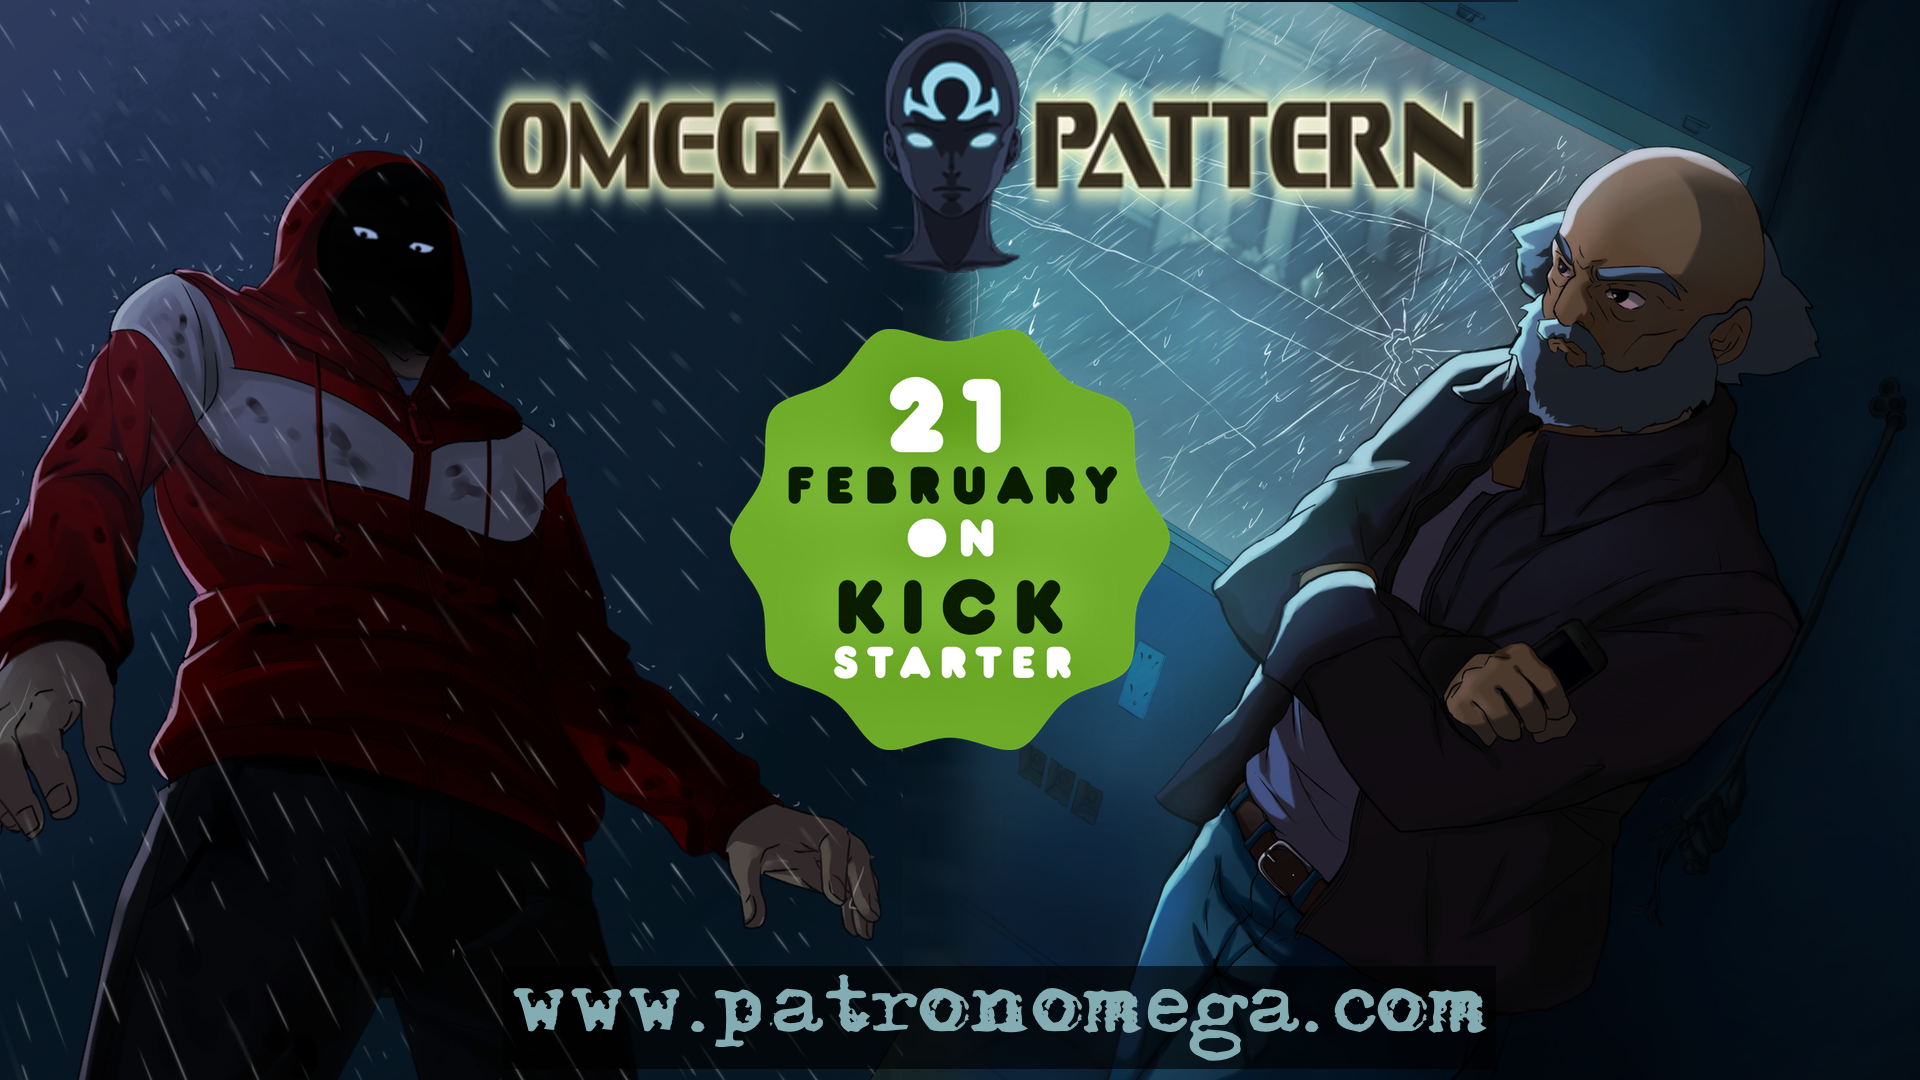 Omega Pattern Kickstarter